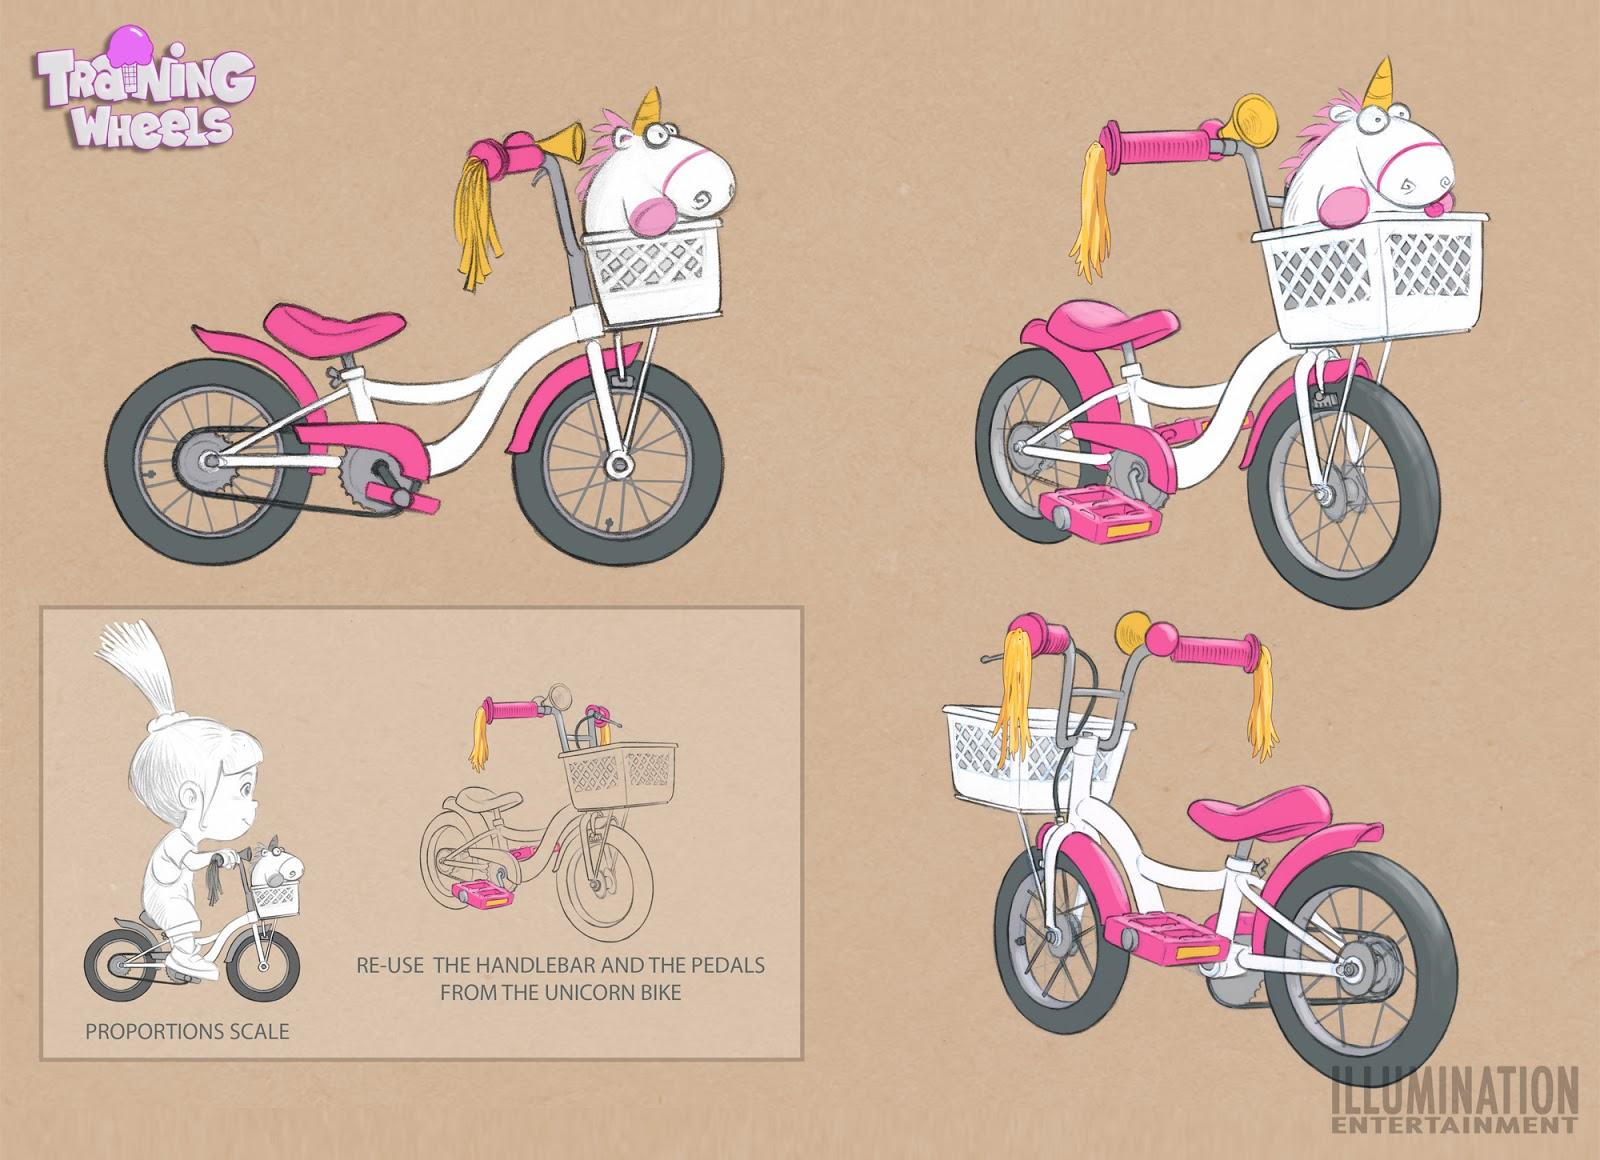 Ludo Gavillet - portfolio: training wheels • designs